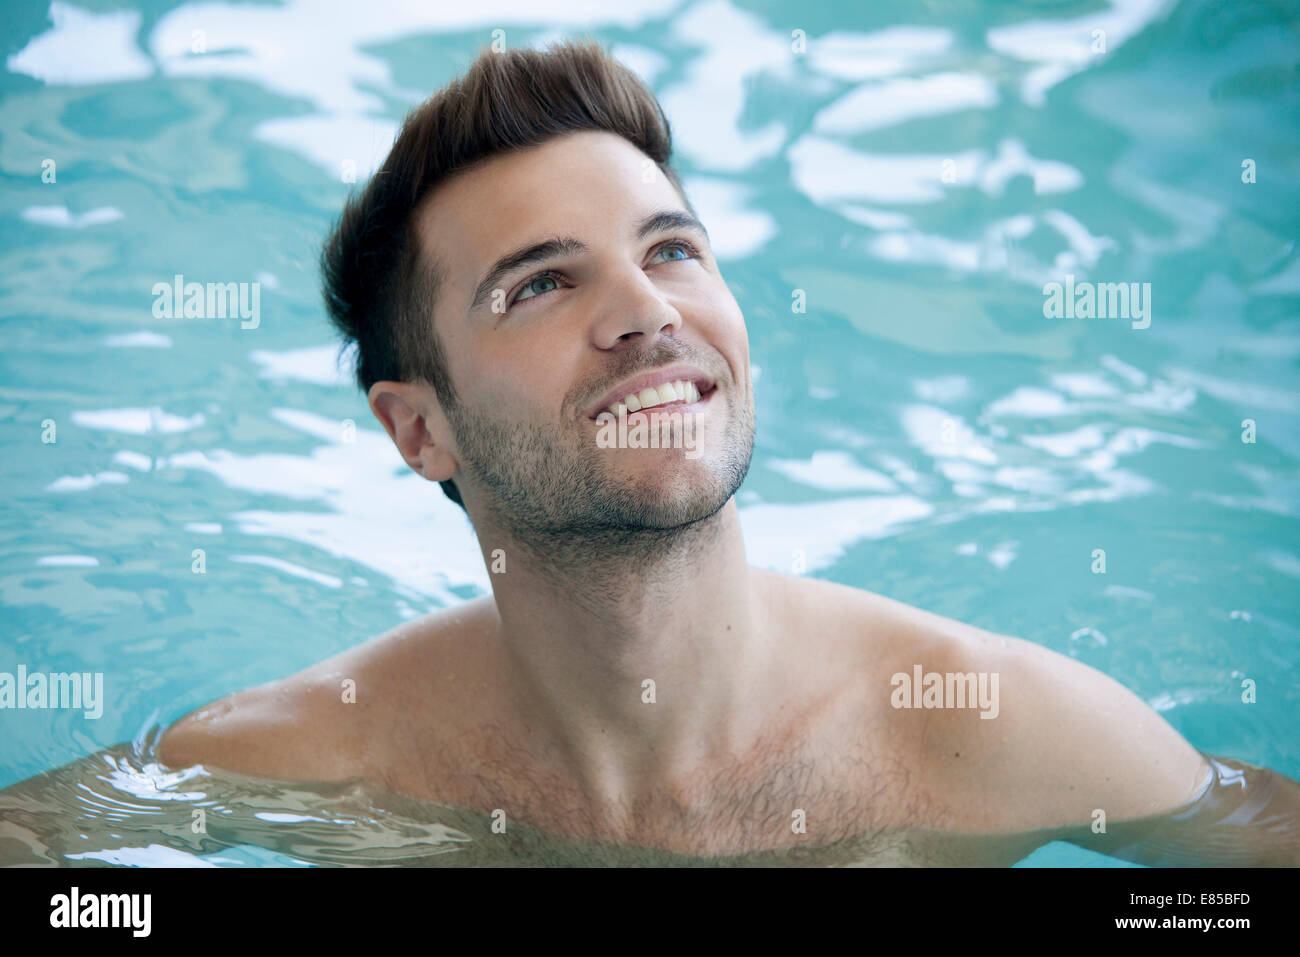 Man swimming in pool, portrait - Stock Image